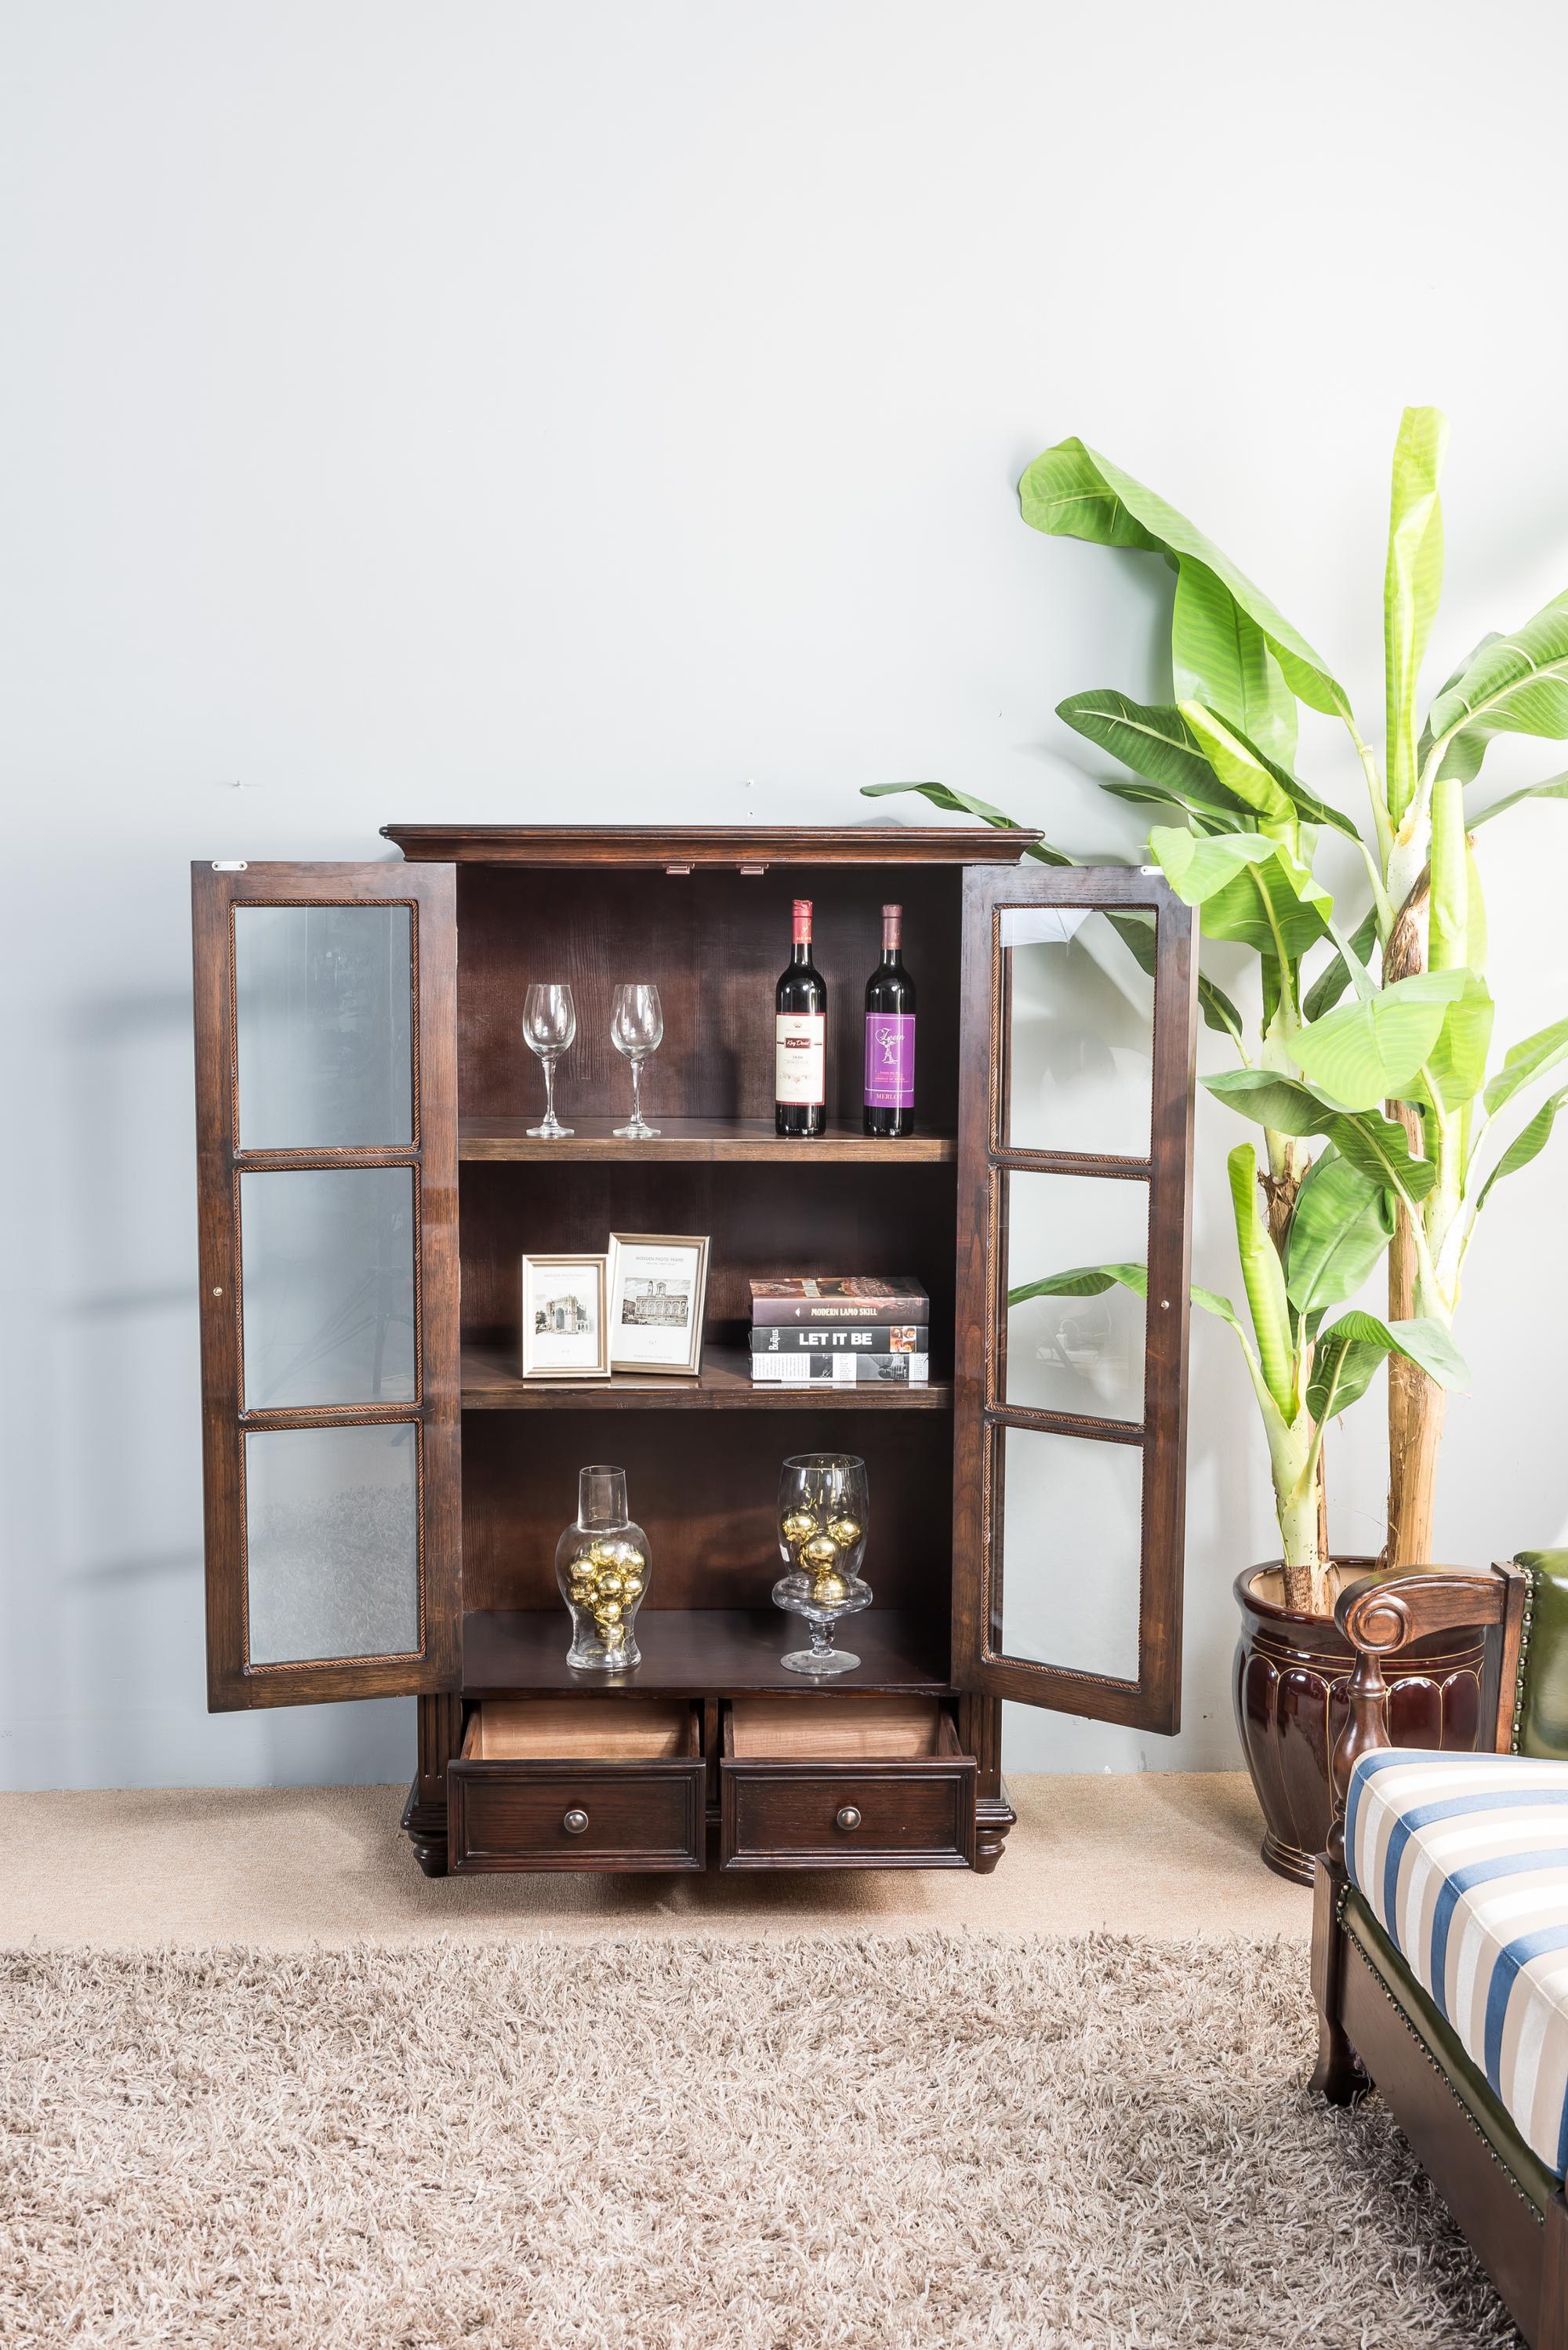 Living Room Showcase Design: New Rococo Style 2018 Fashion Living Room Showcase Design